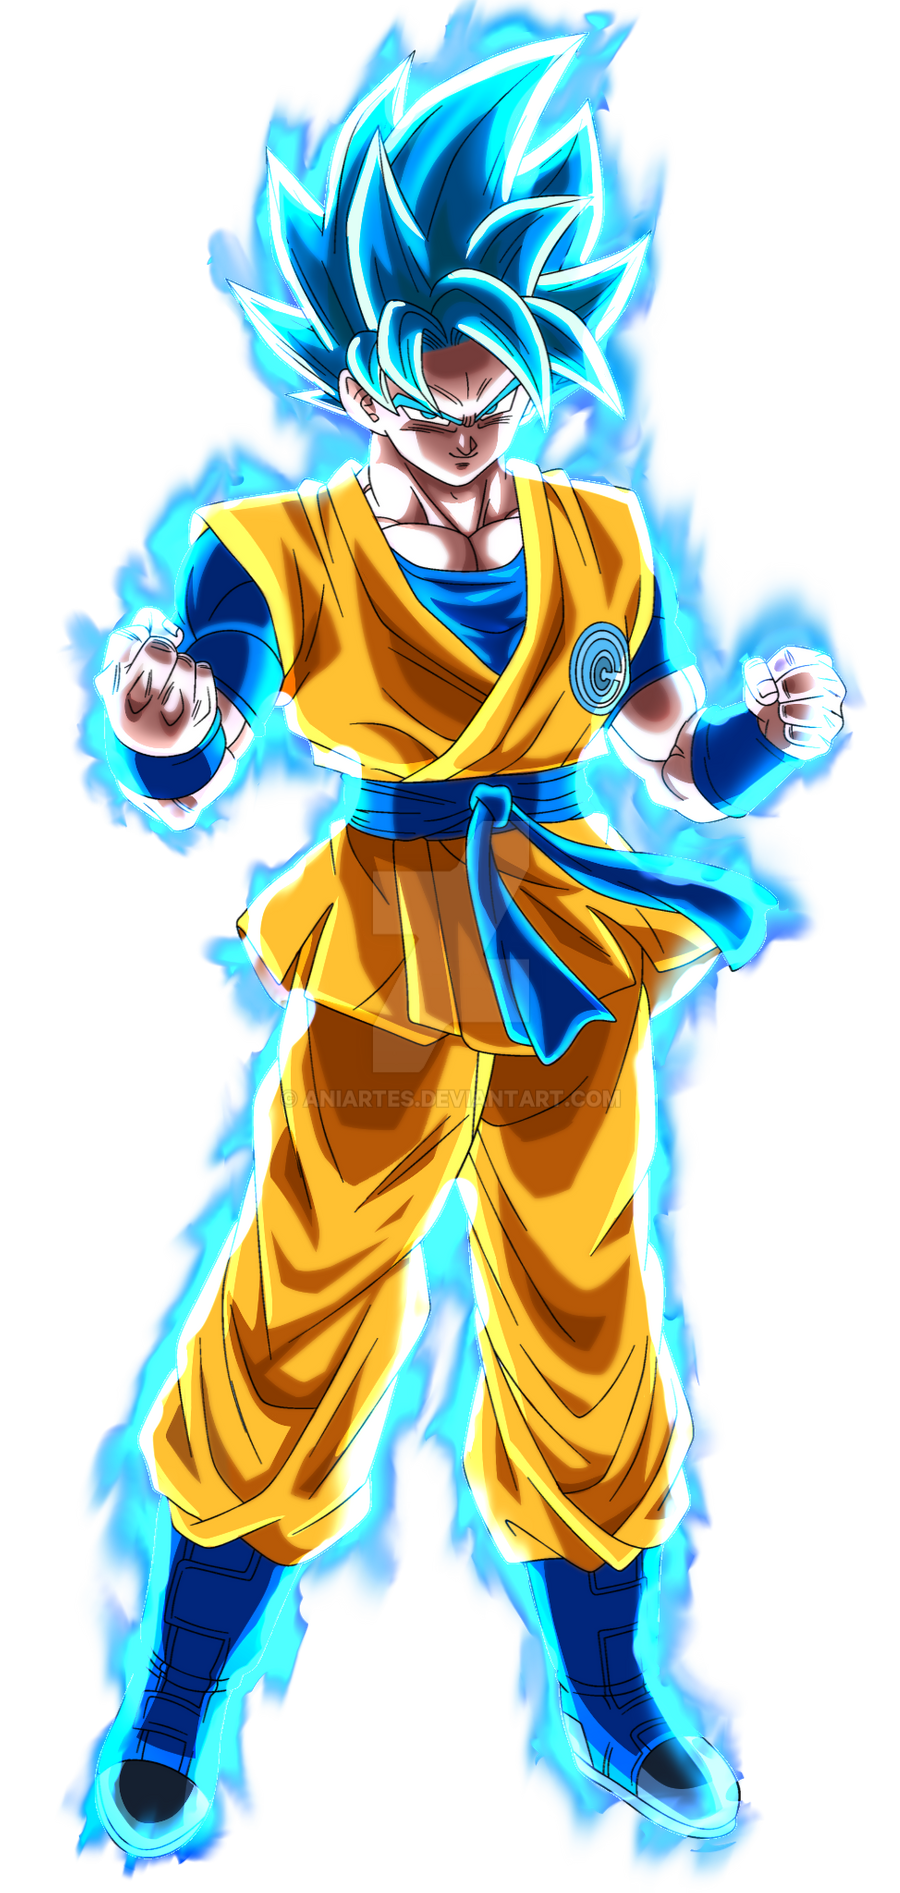 Goku Ssj Blue Aura By Aniartes On Deviantart Anime Dragon Ball Super Dragon Ball Image Dragon Ball Super Manga